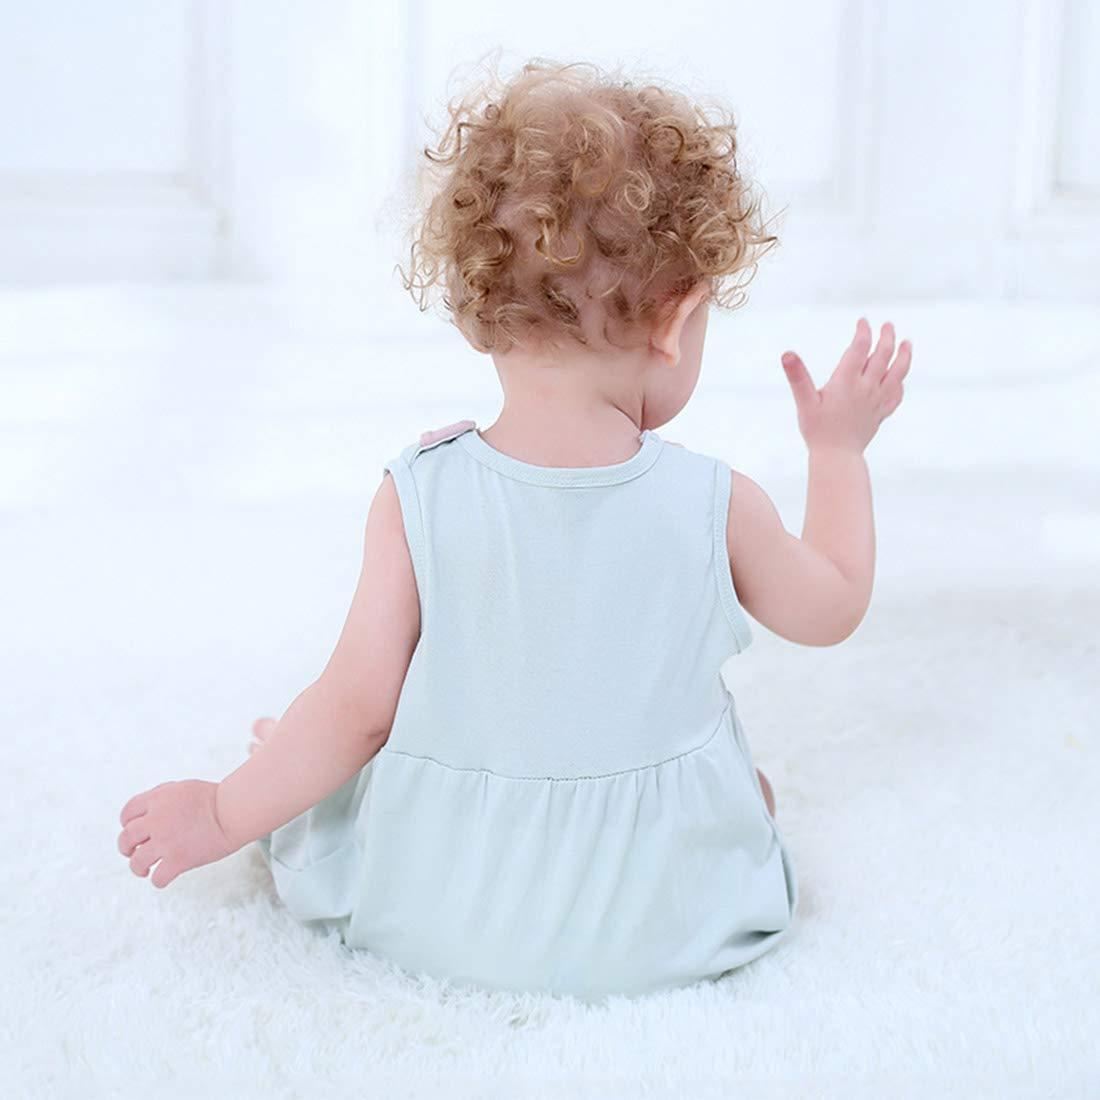 PAUBOLI Baby Fox Romper Newborn Cotton One Piece Pajamas 0-24 Months